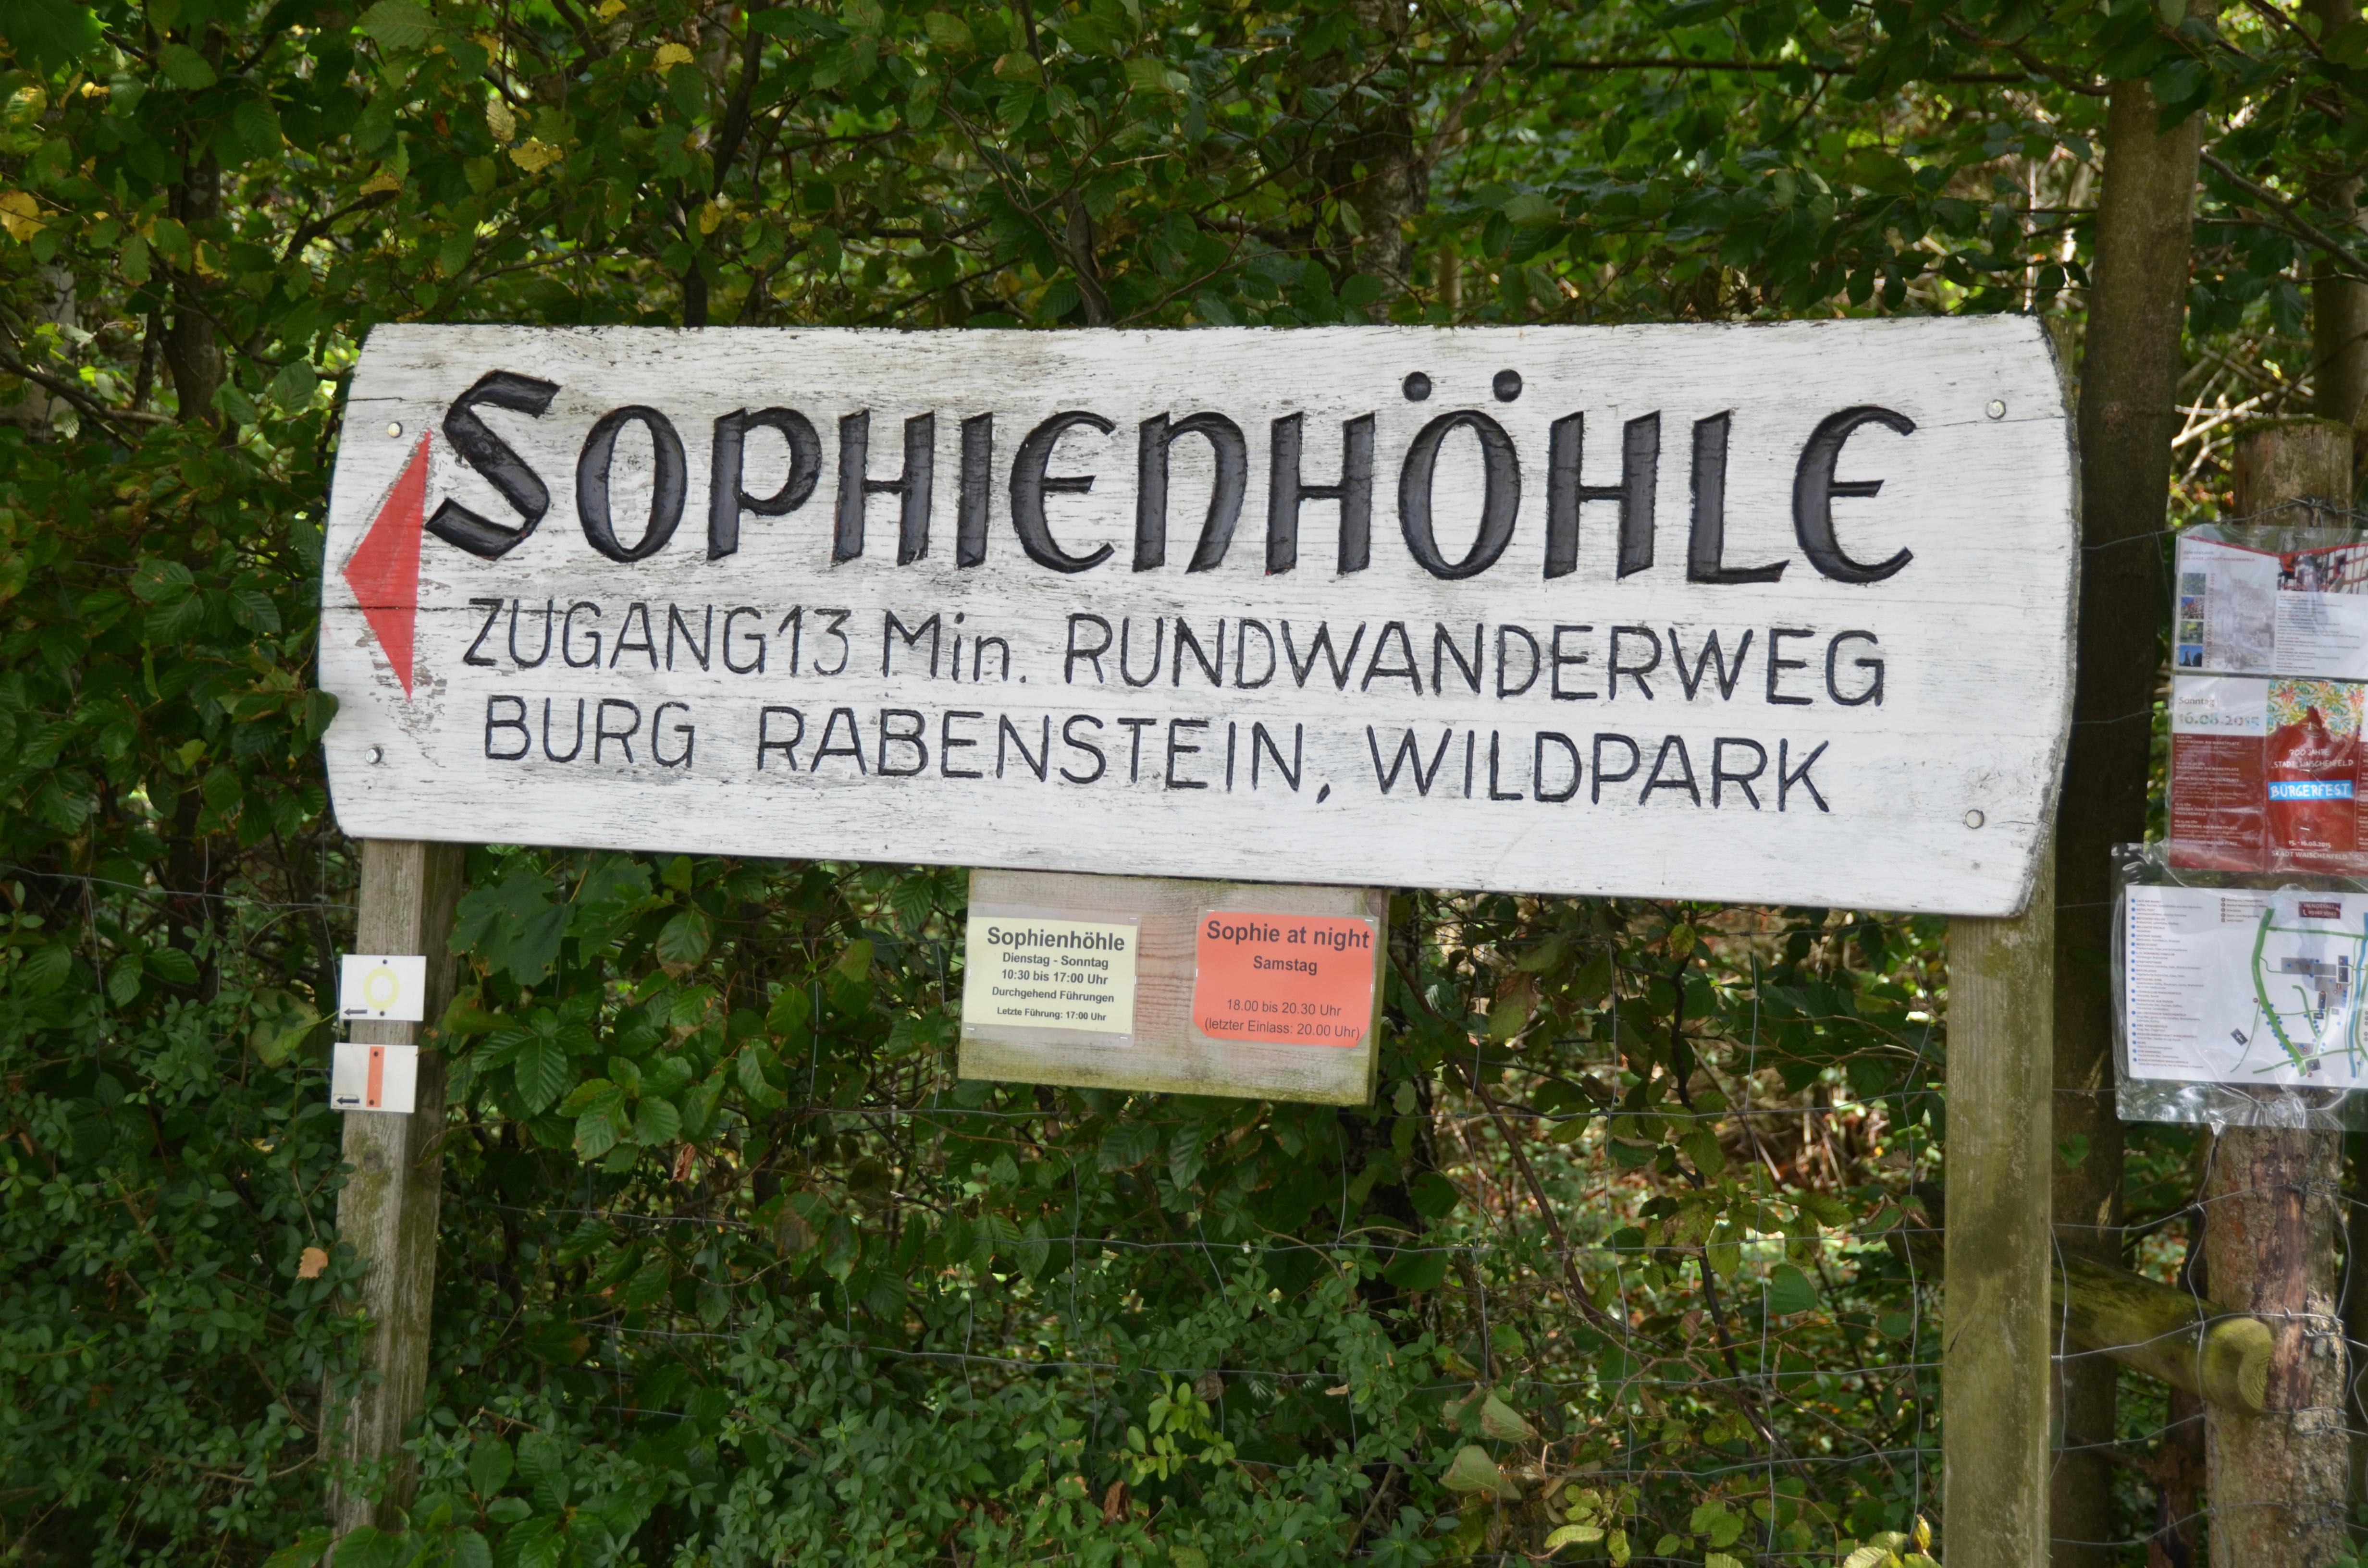 Sophienhöhle Schild